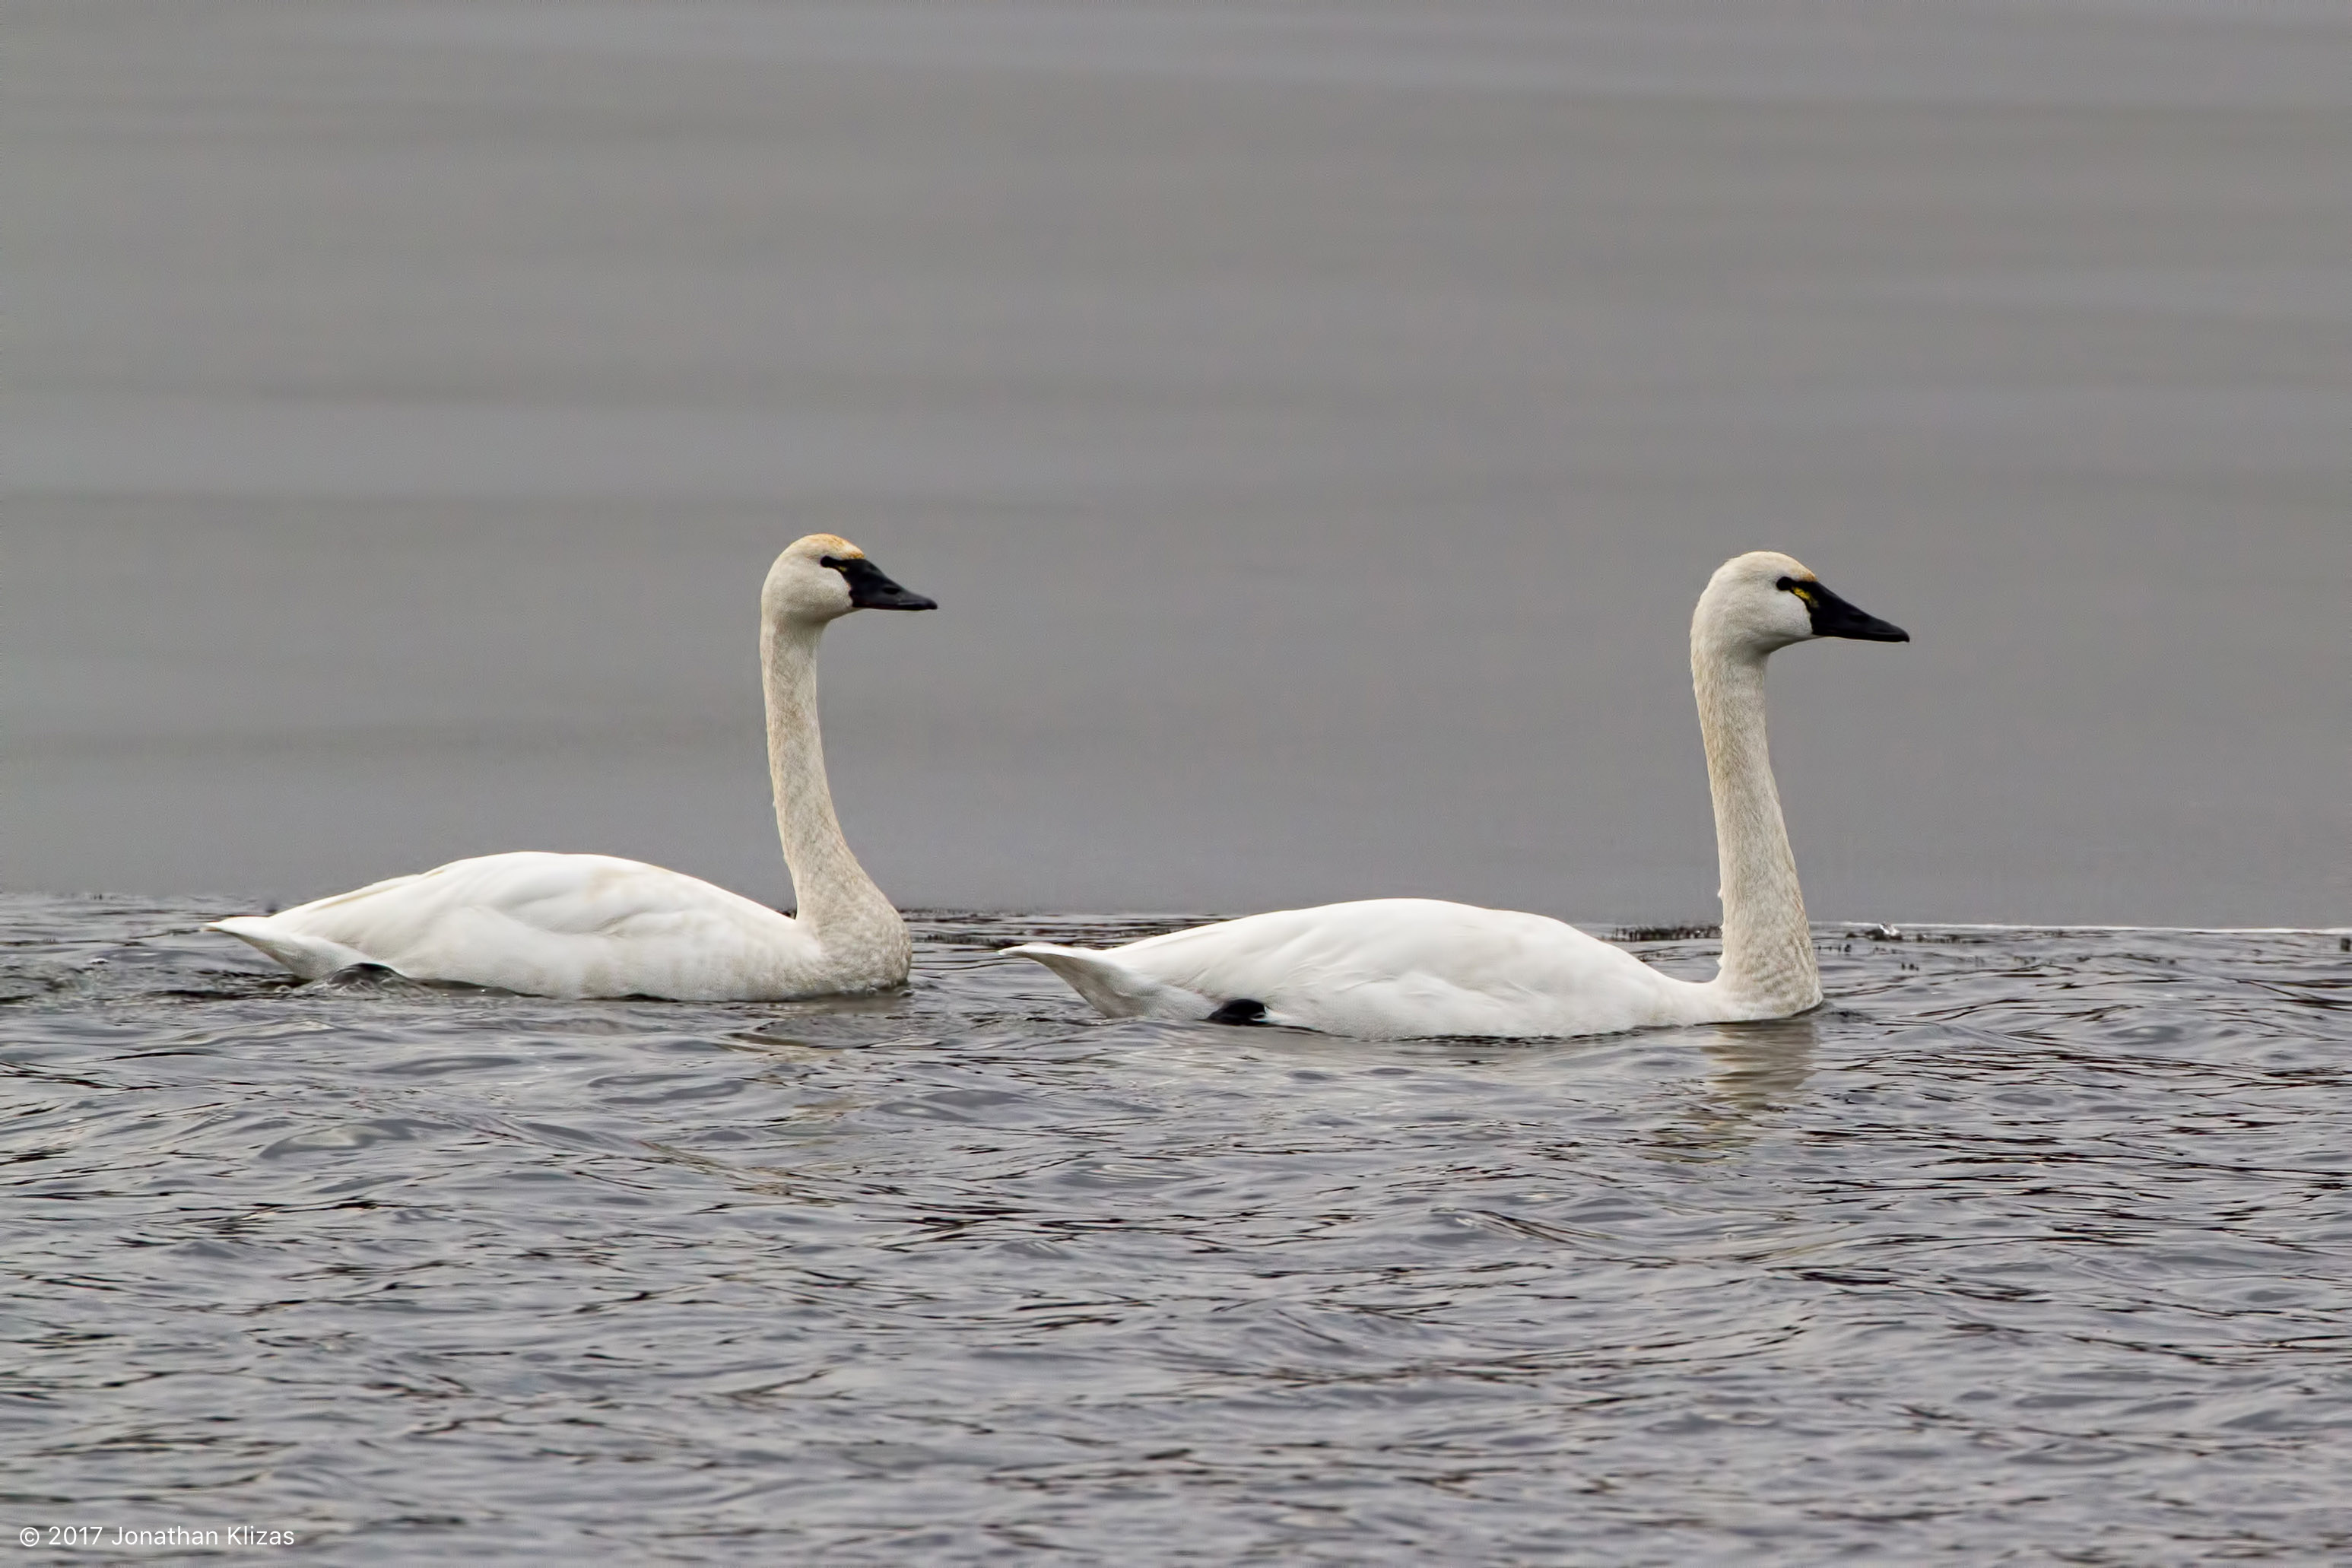 Tundra Swans Lake Hopatcong Nj Feb 8